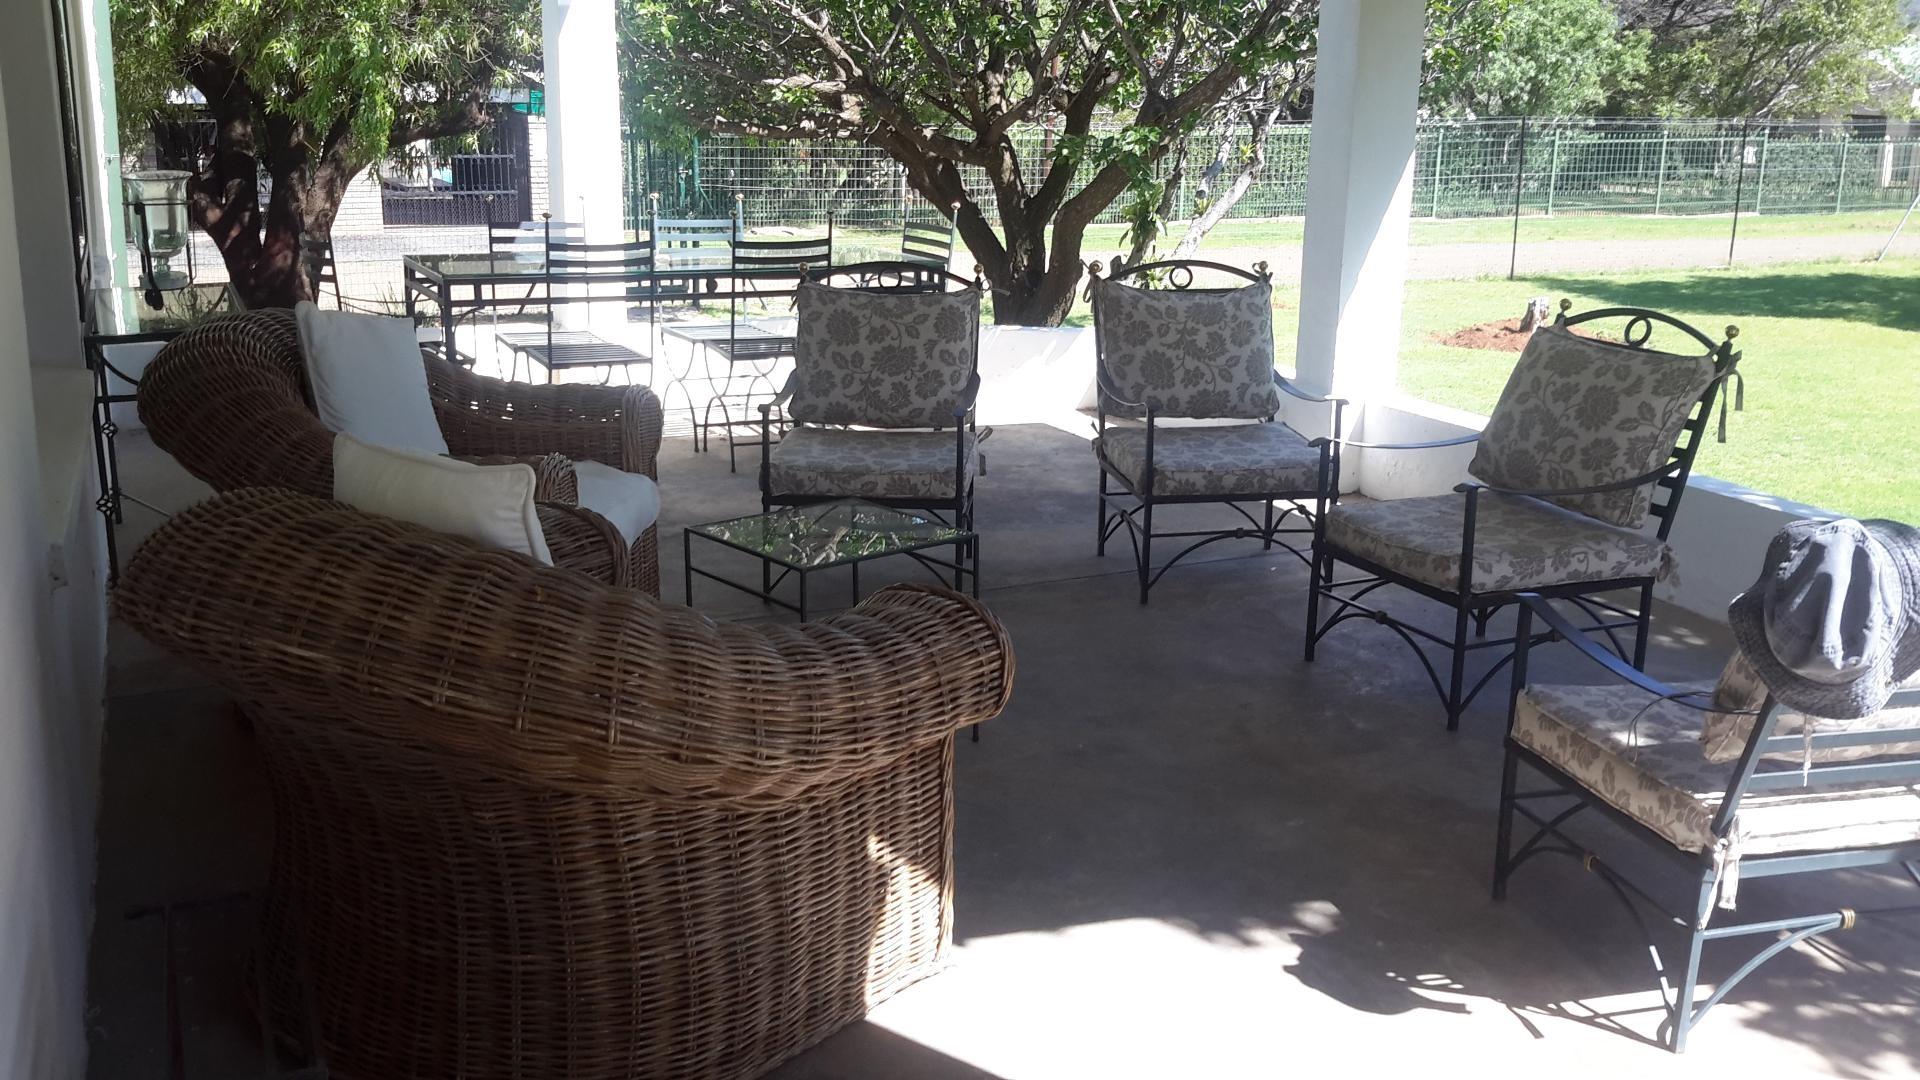 Large veranda outside overlooking garden